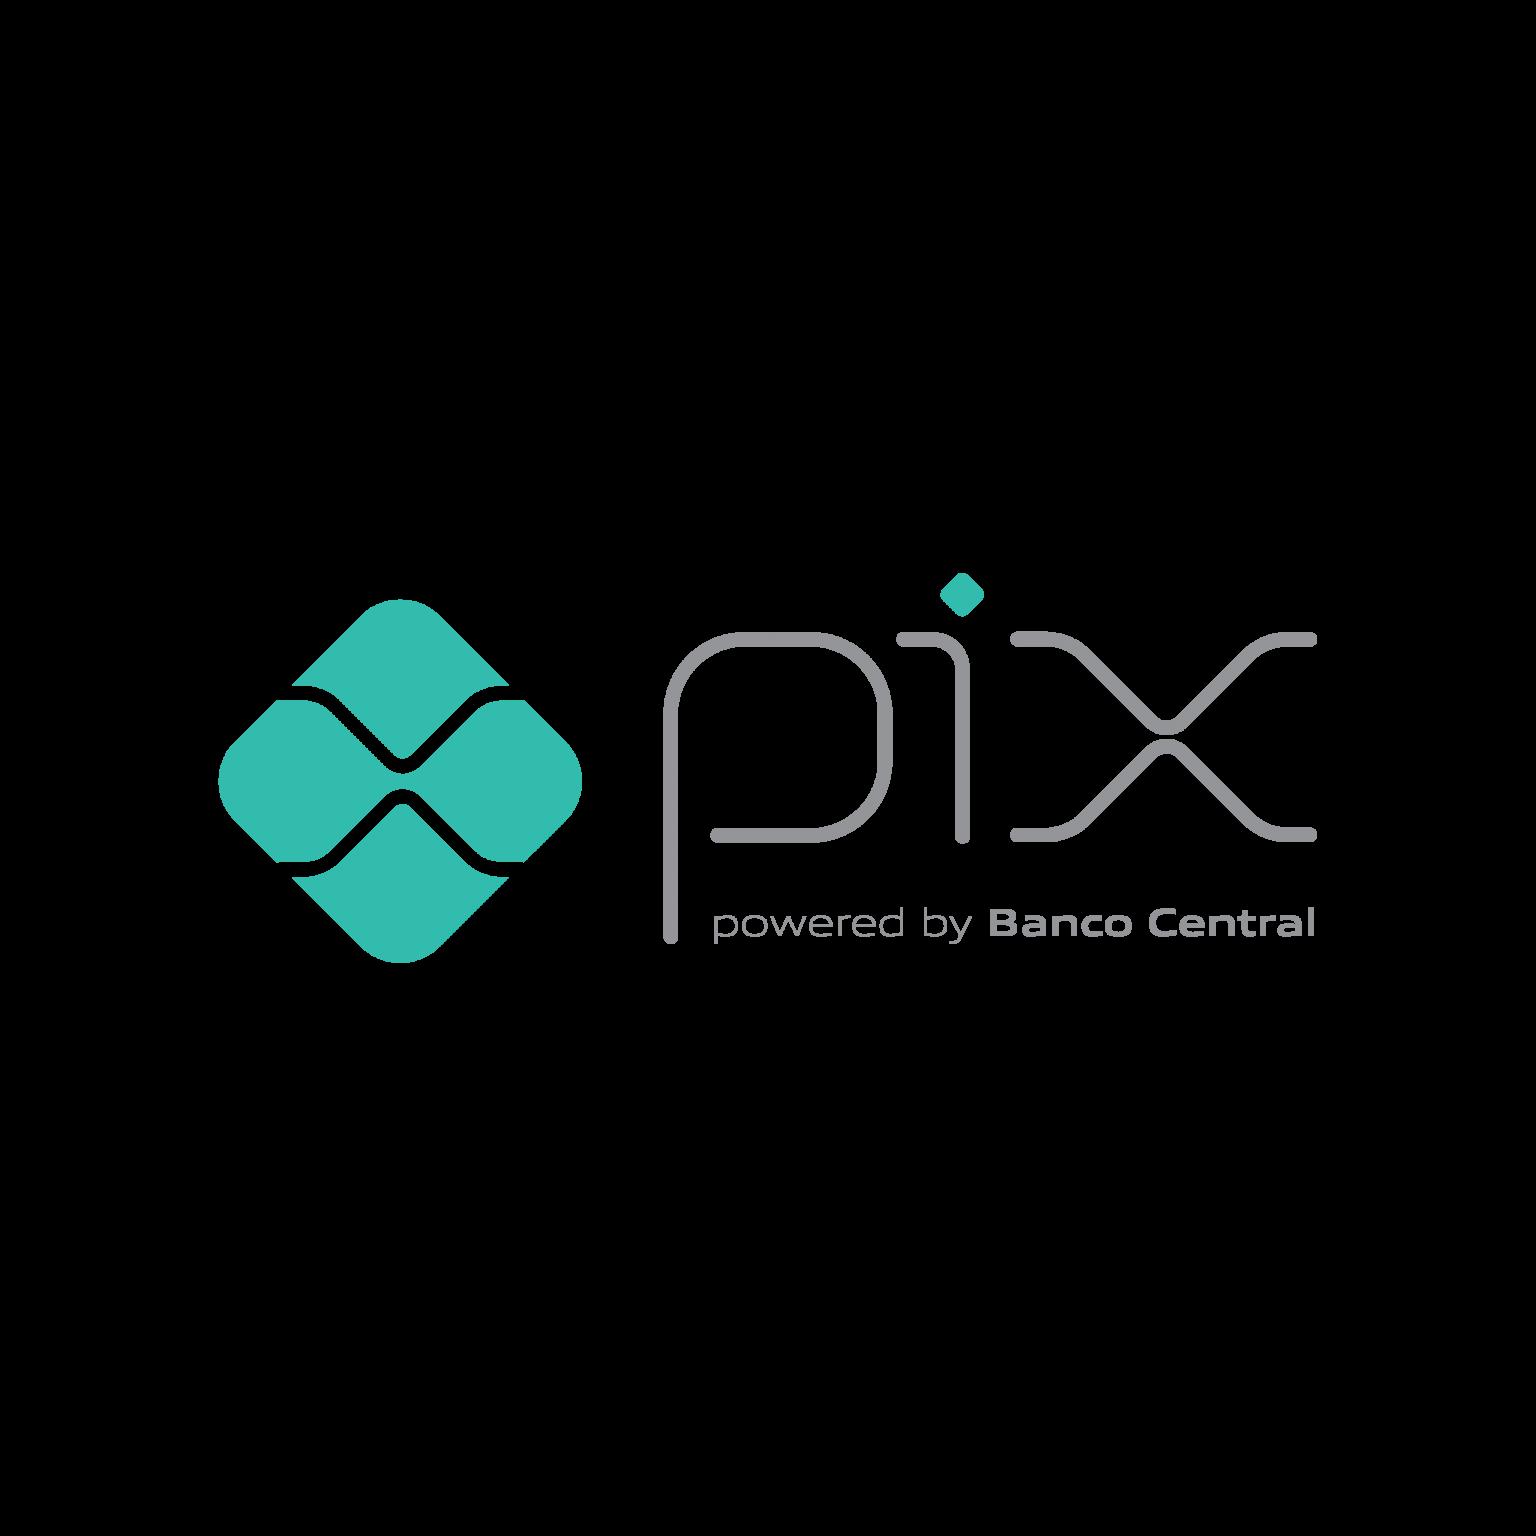 logodownload.org/wp-content/uploads/2020/02/pix-bc-logo-0-1536x1536.png